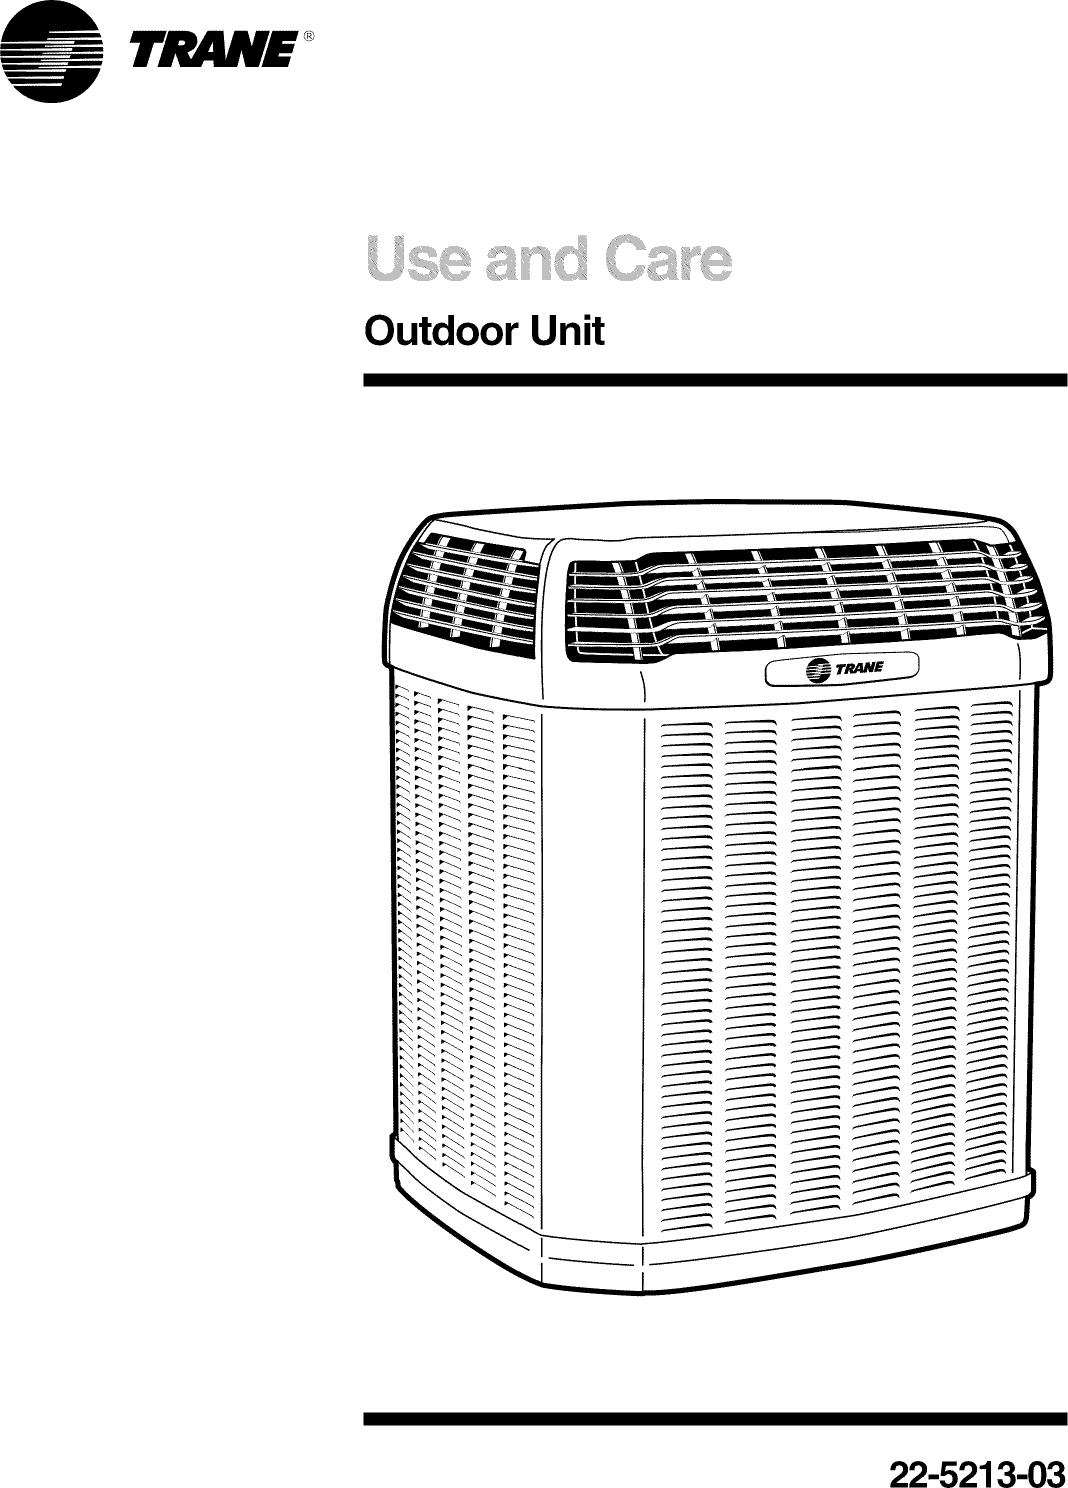 Trane Air Conditioner Heat Pump Outside Unit Manual L0904653